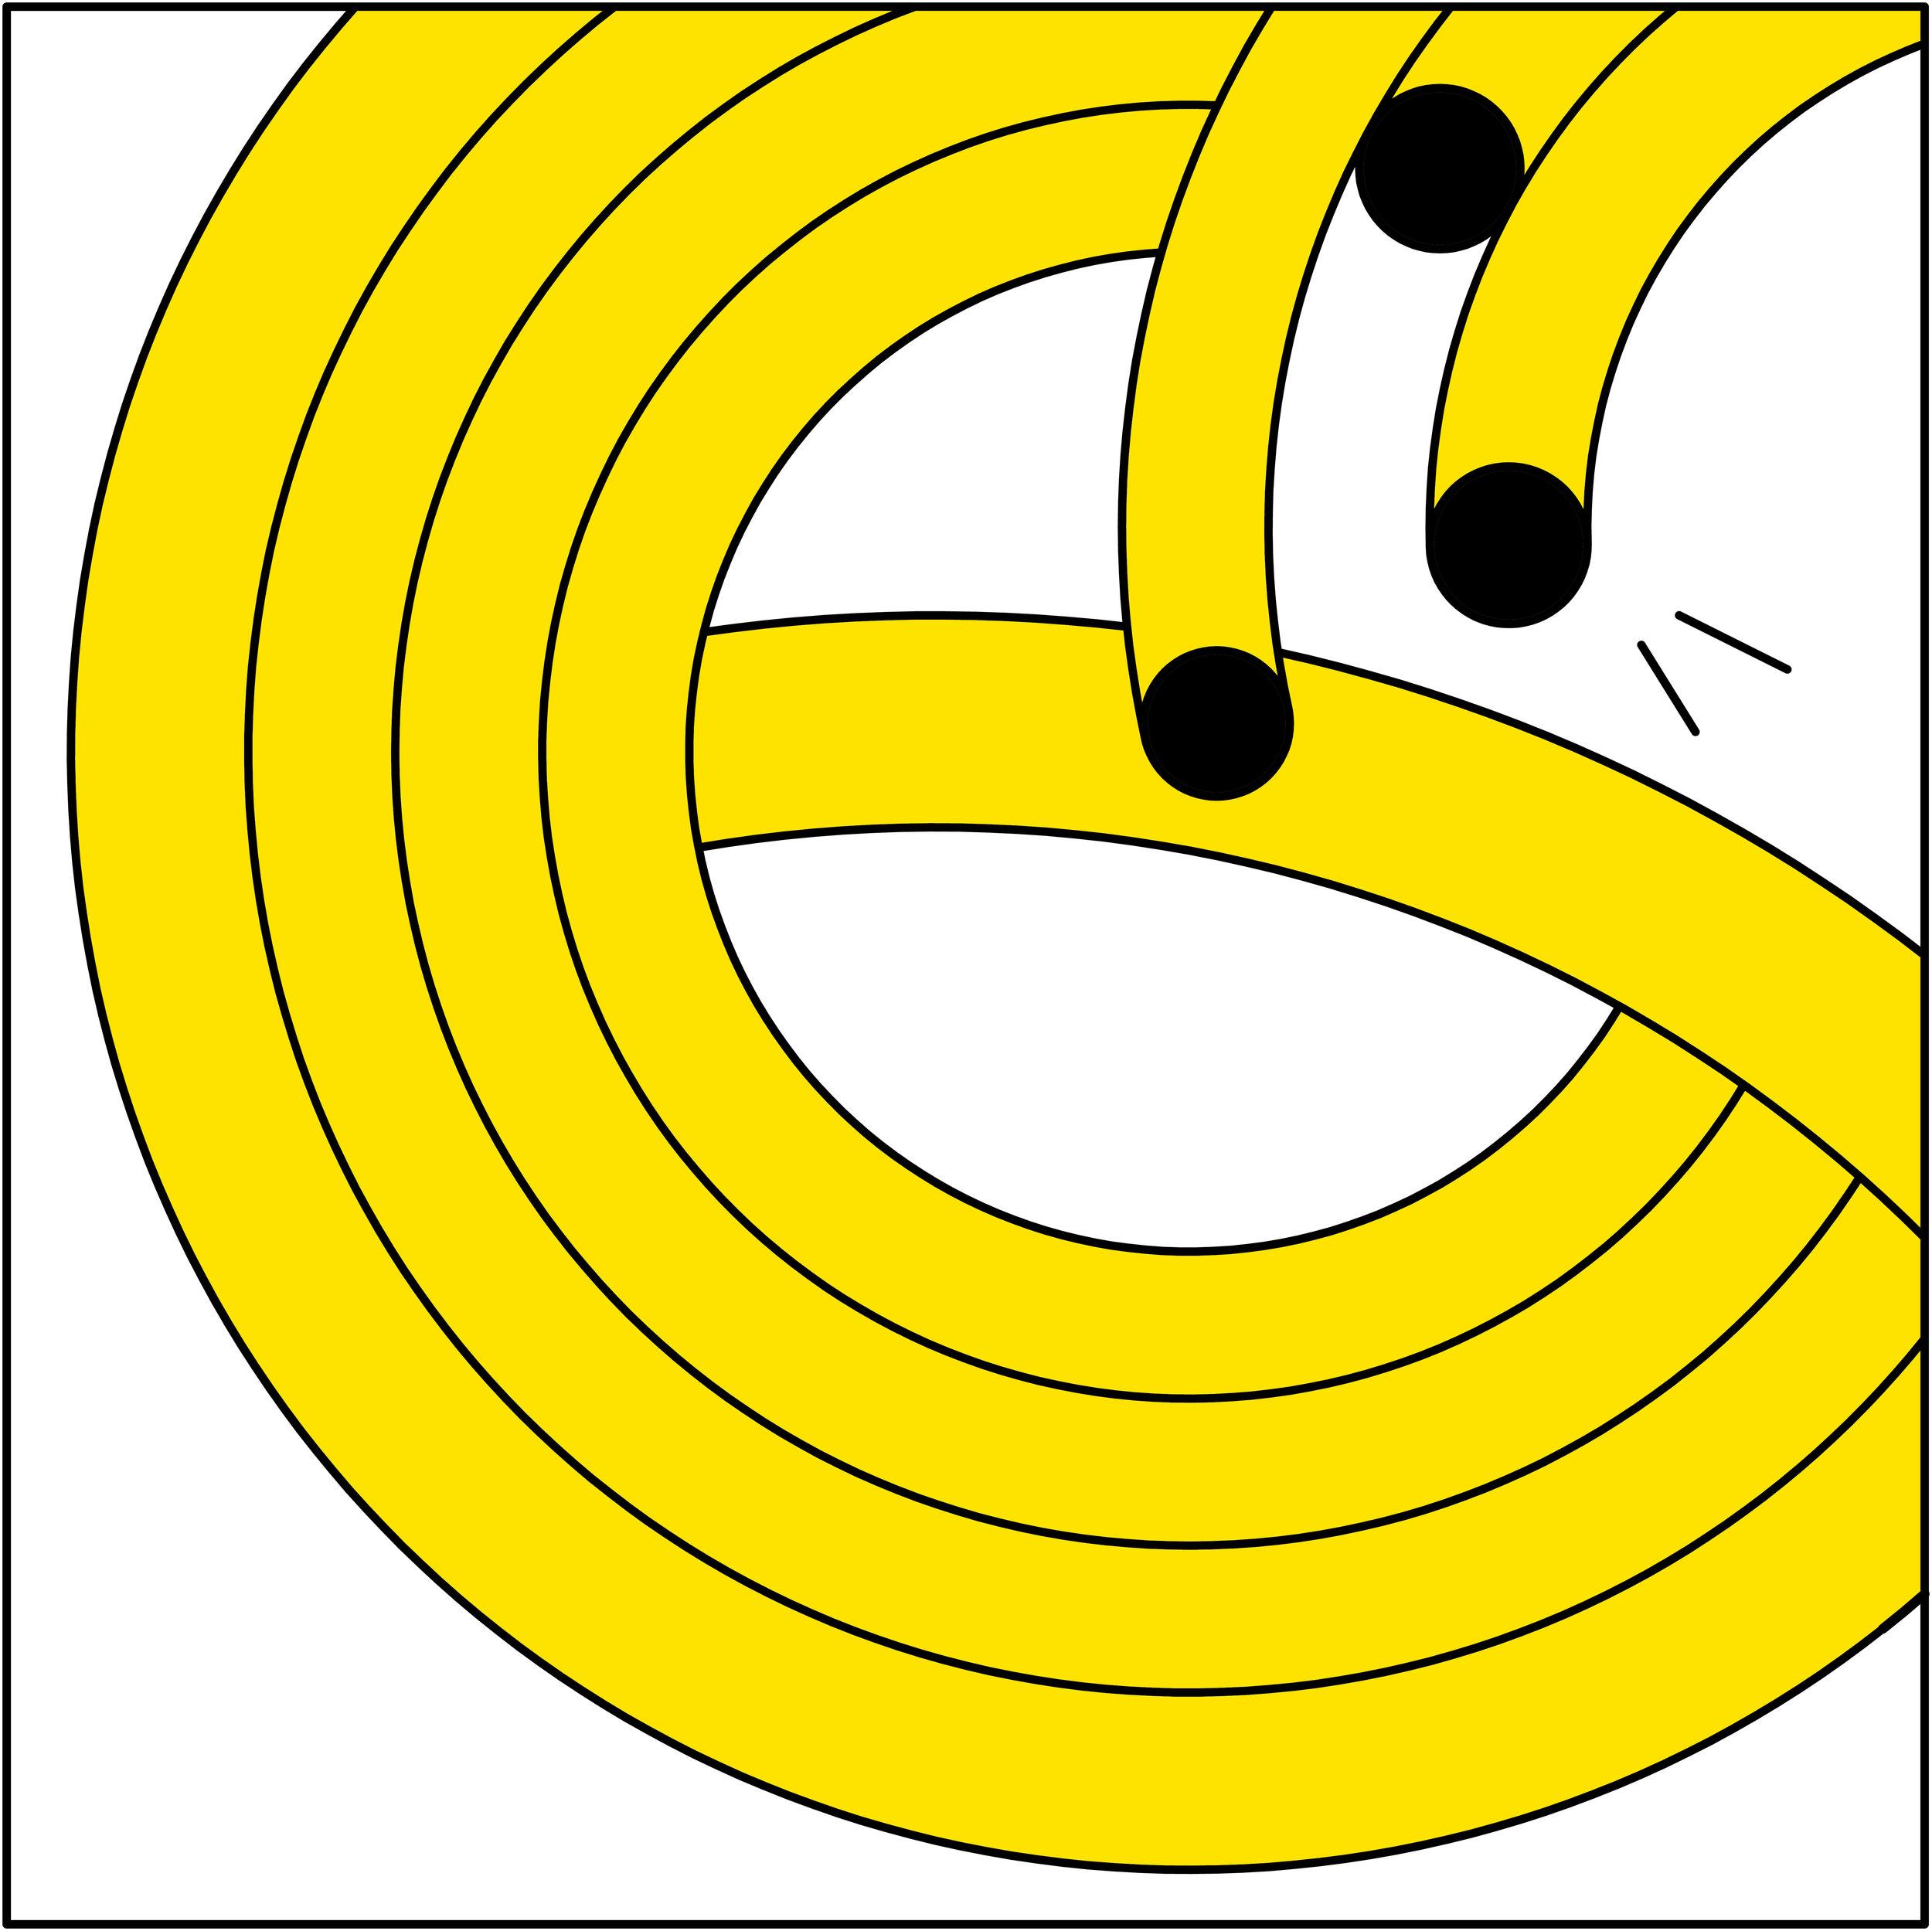 spaghetti yellow - 026.jpg